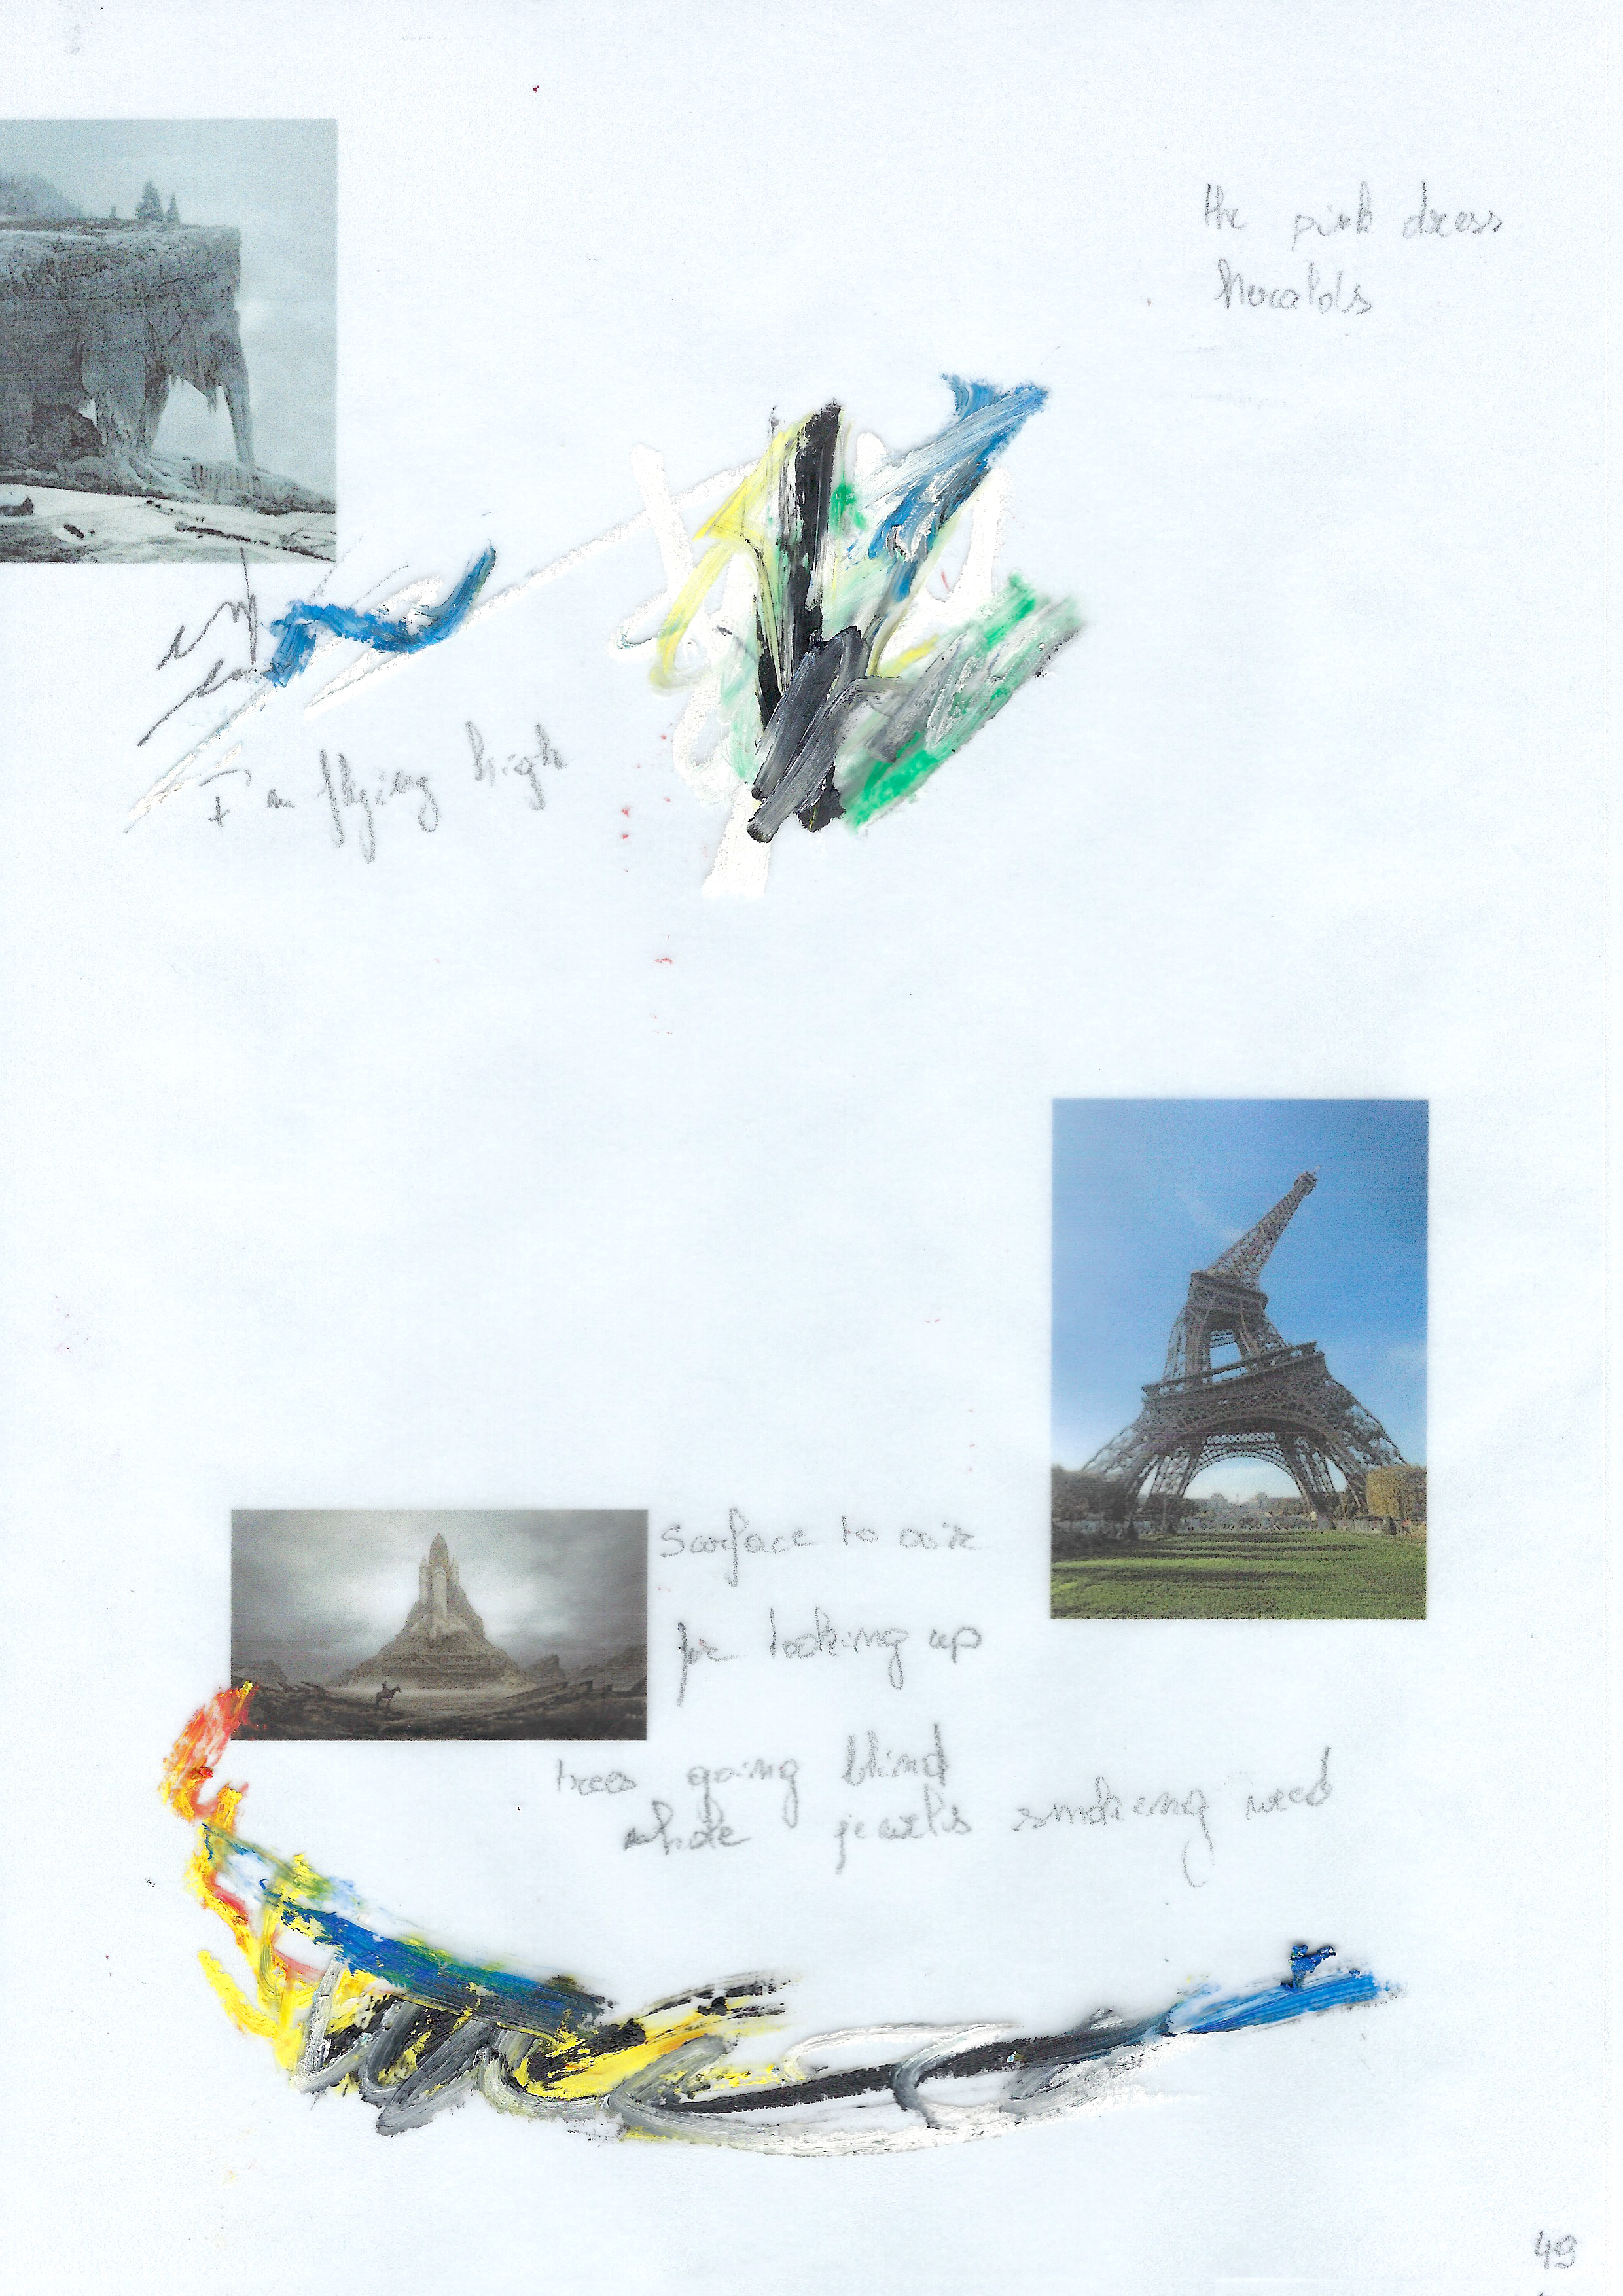 #49 (monuments)